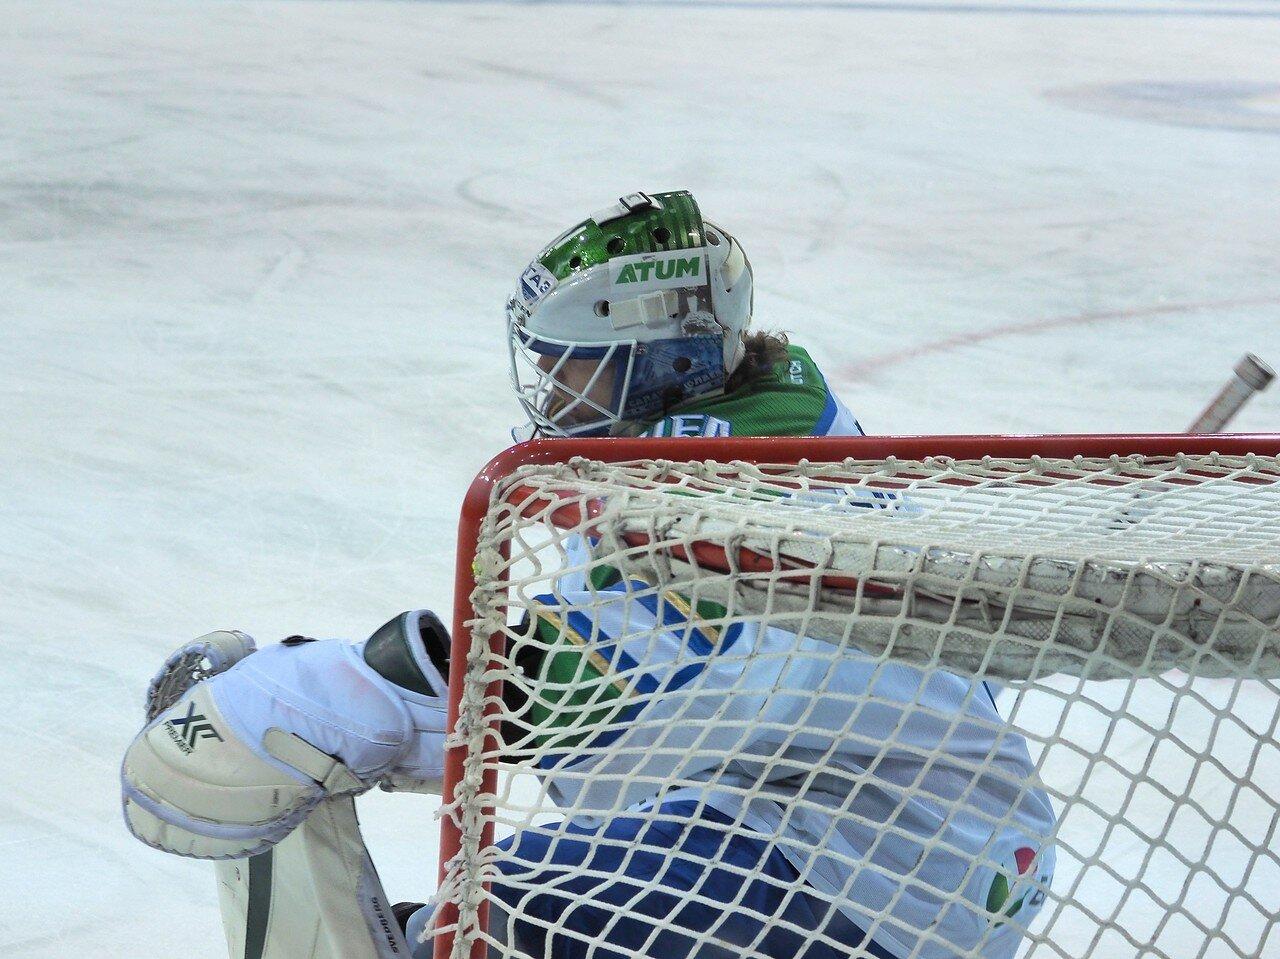 10Плей-офф 2016 Восток Финал Металлург - Салават Юлаев 31.03.2016